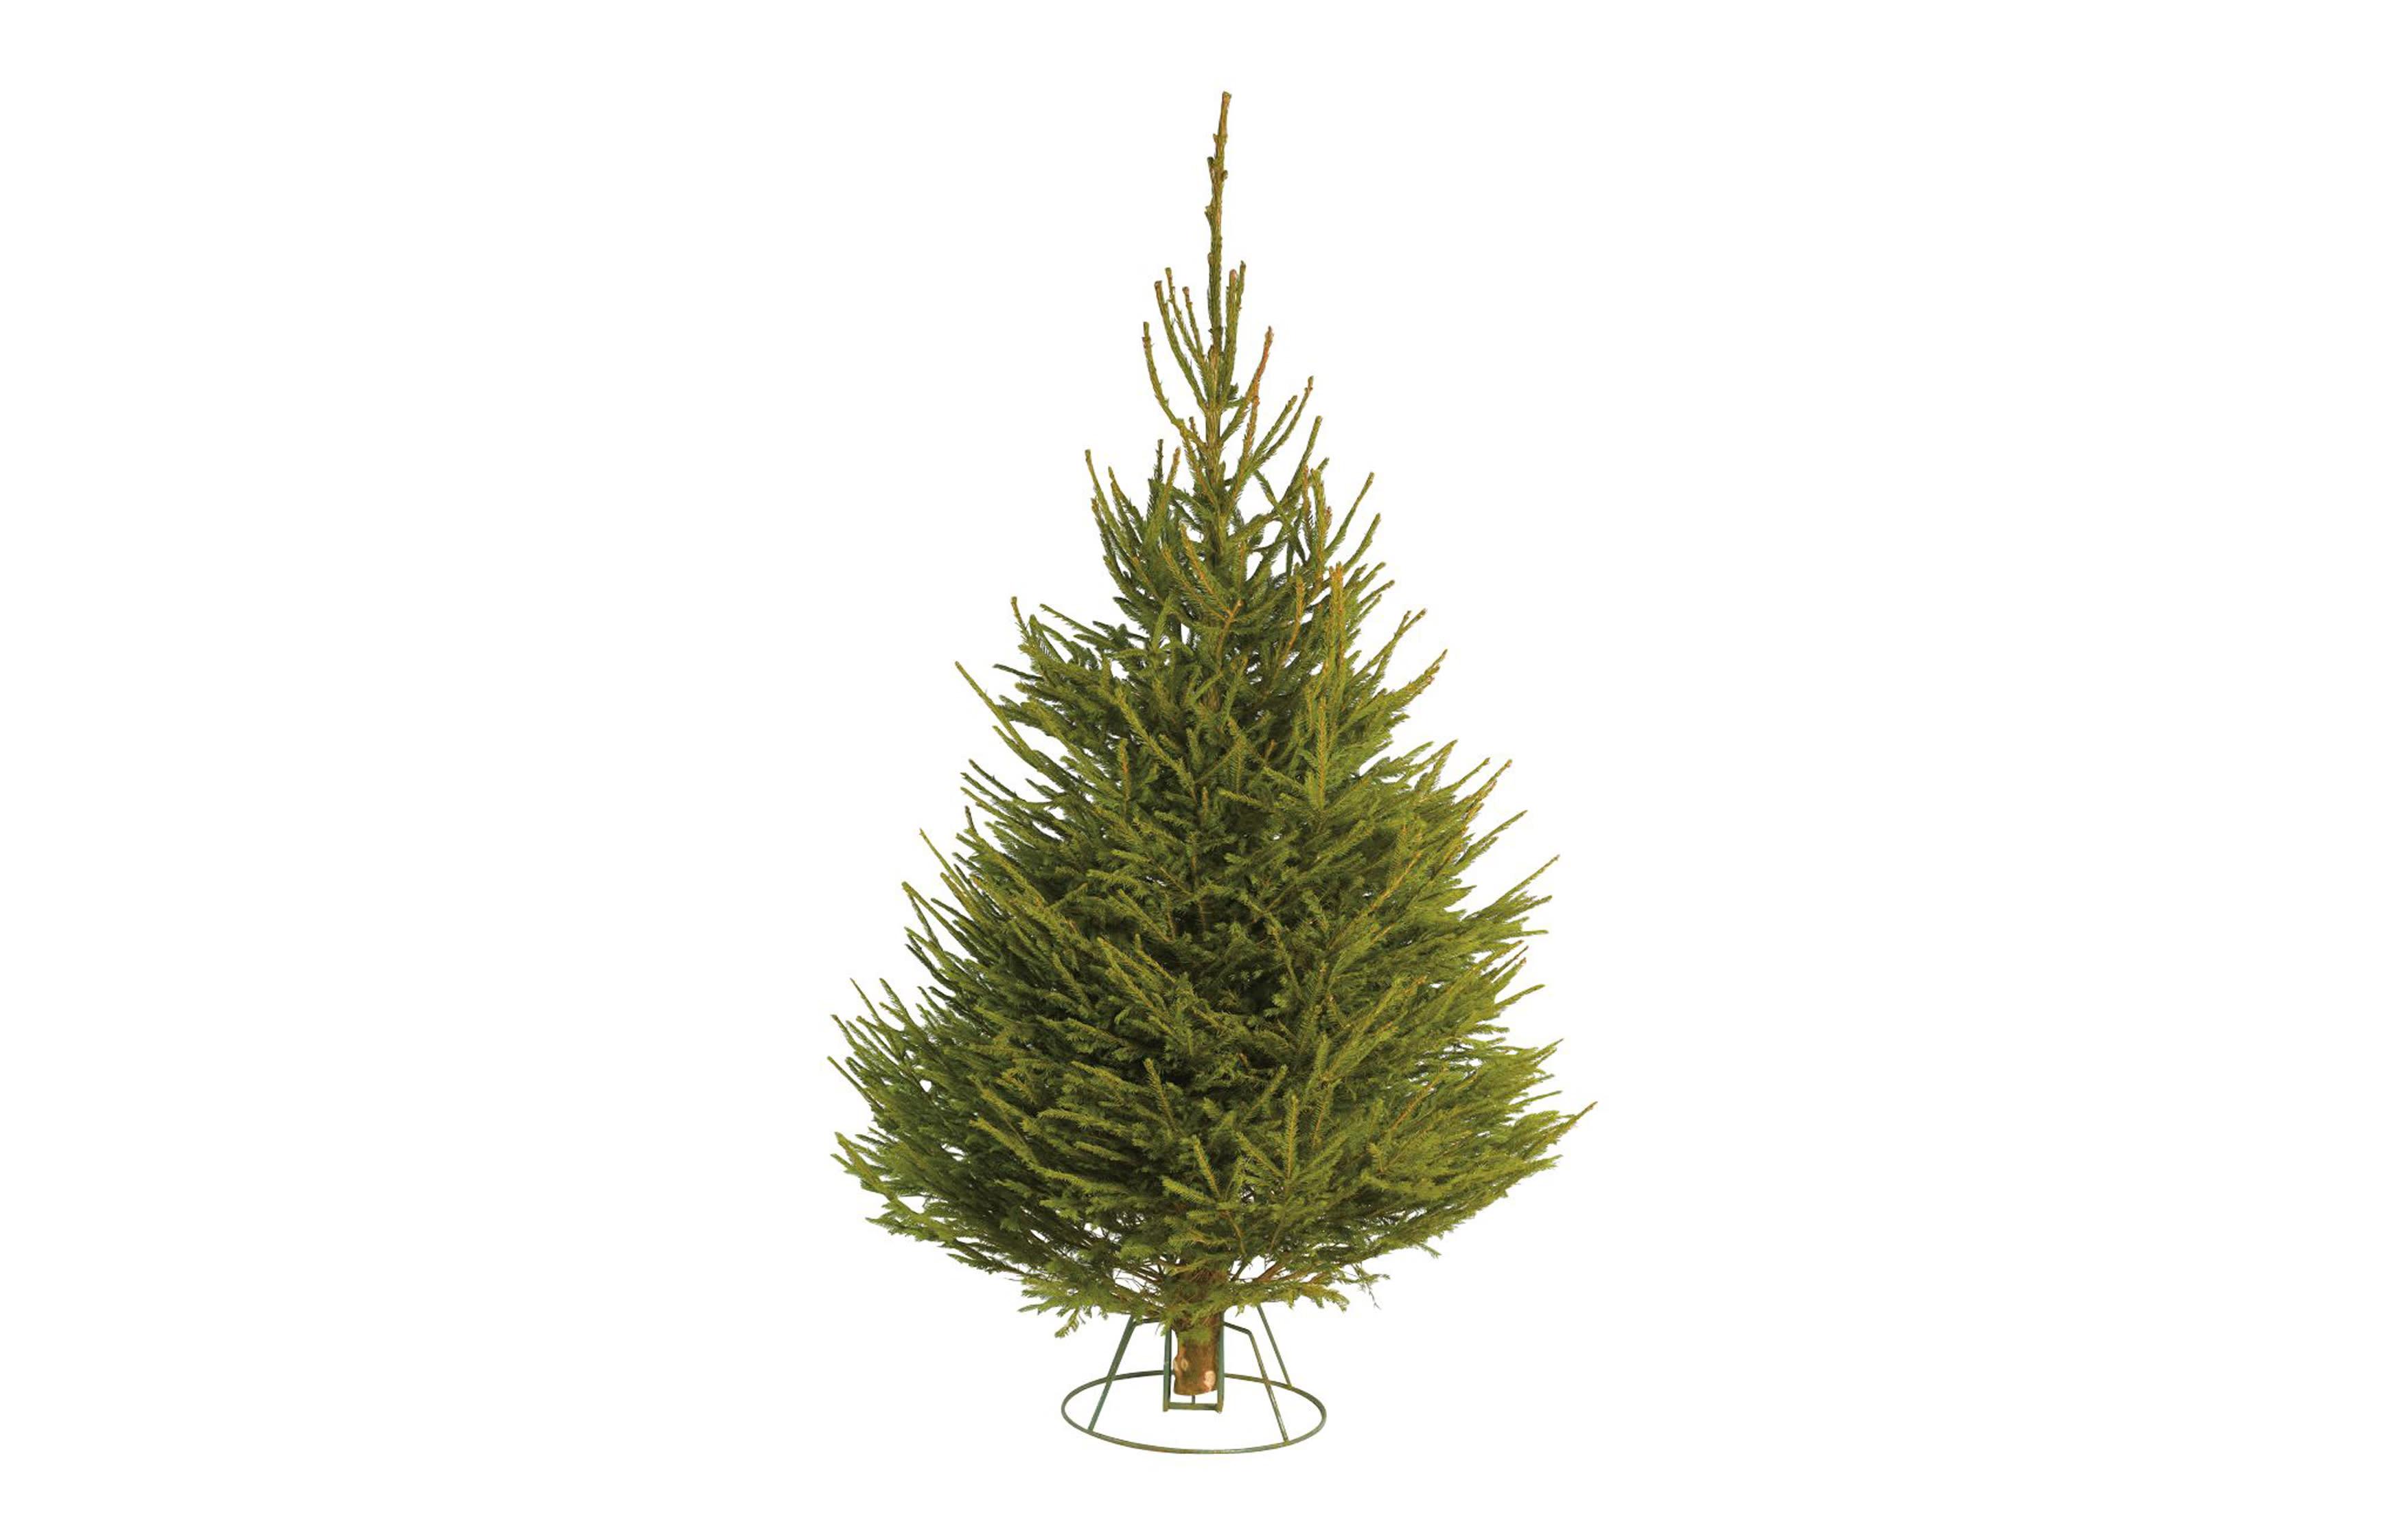 Where To Buy Cheap Fake Christmas Trees